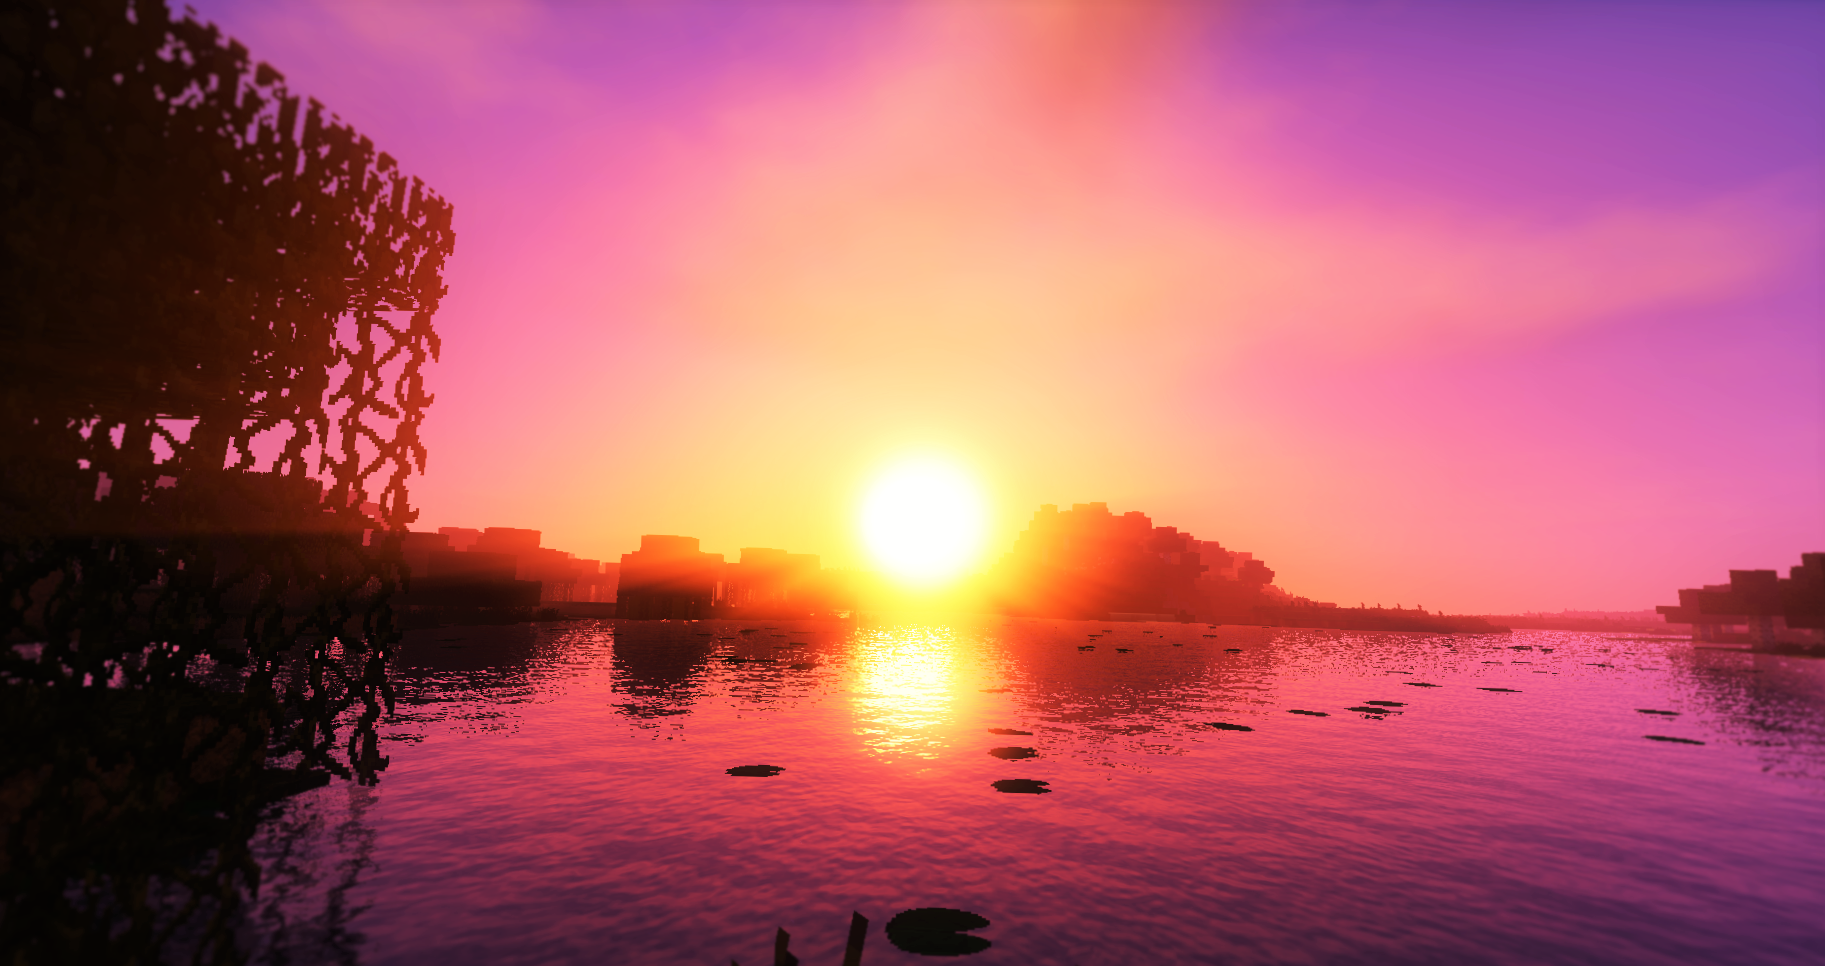 Sunshine Wallpaper and Background Image | 1825x966 | ID ... - Fond D'ecran Minecraft